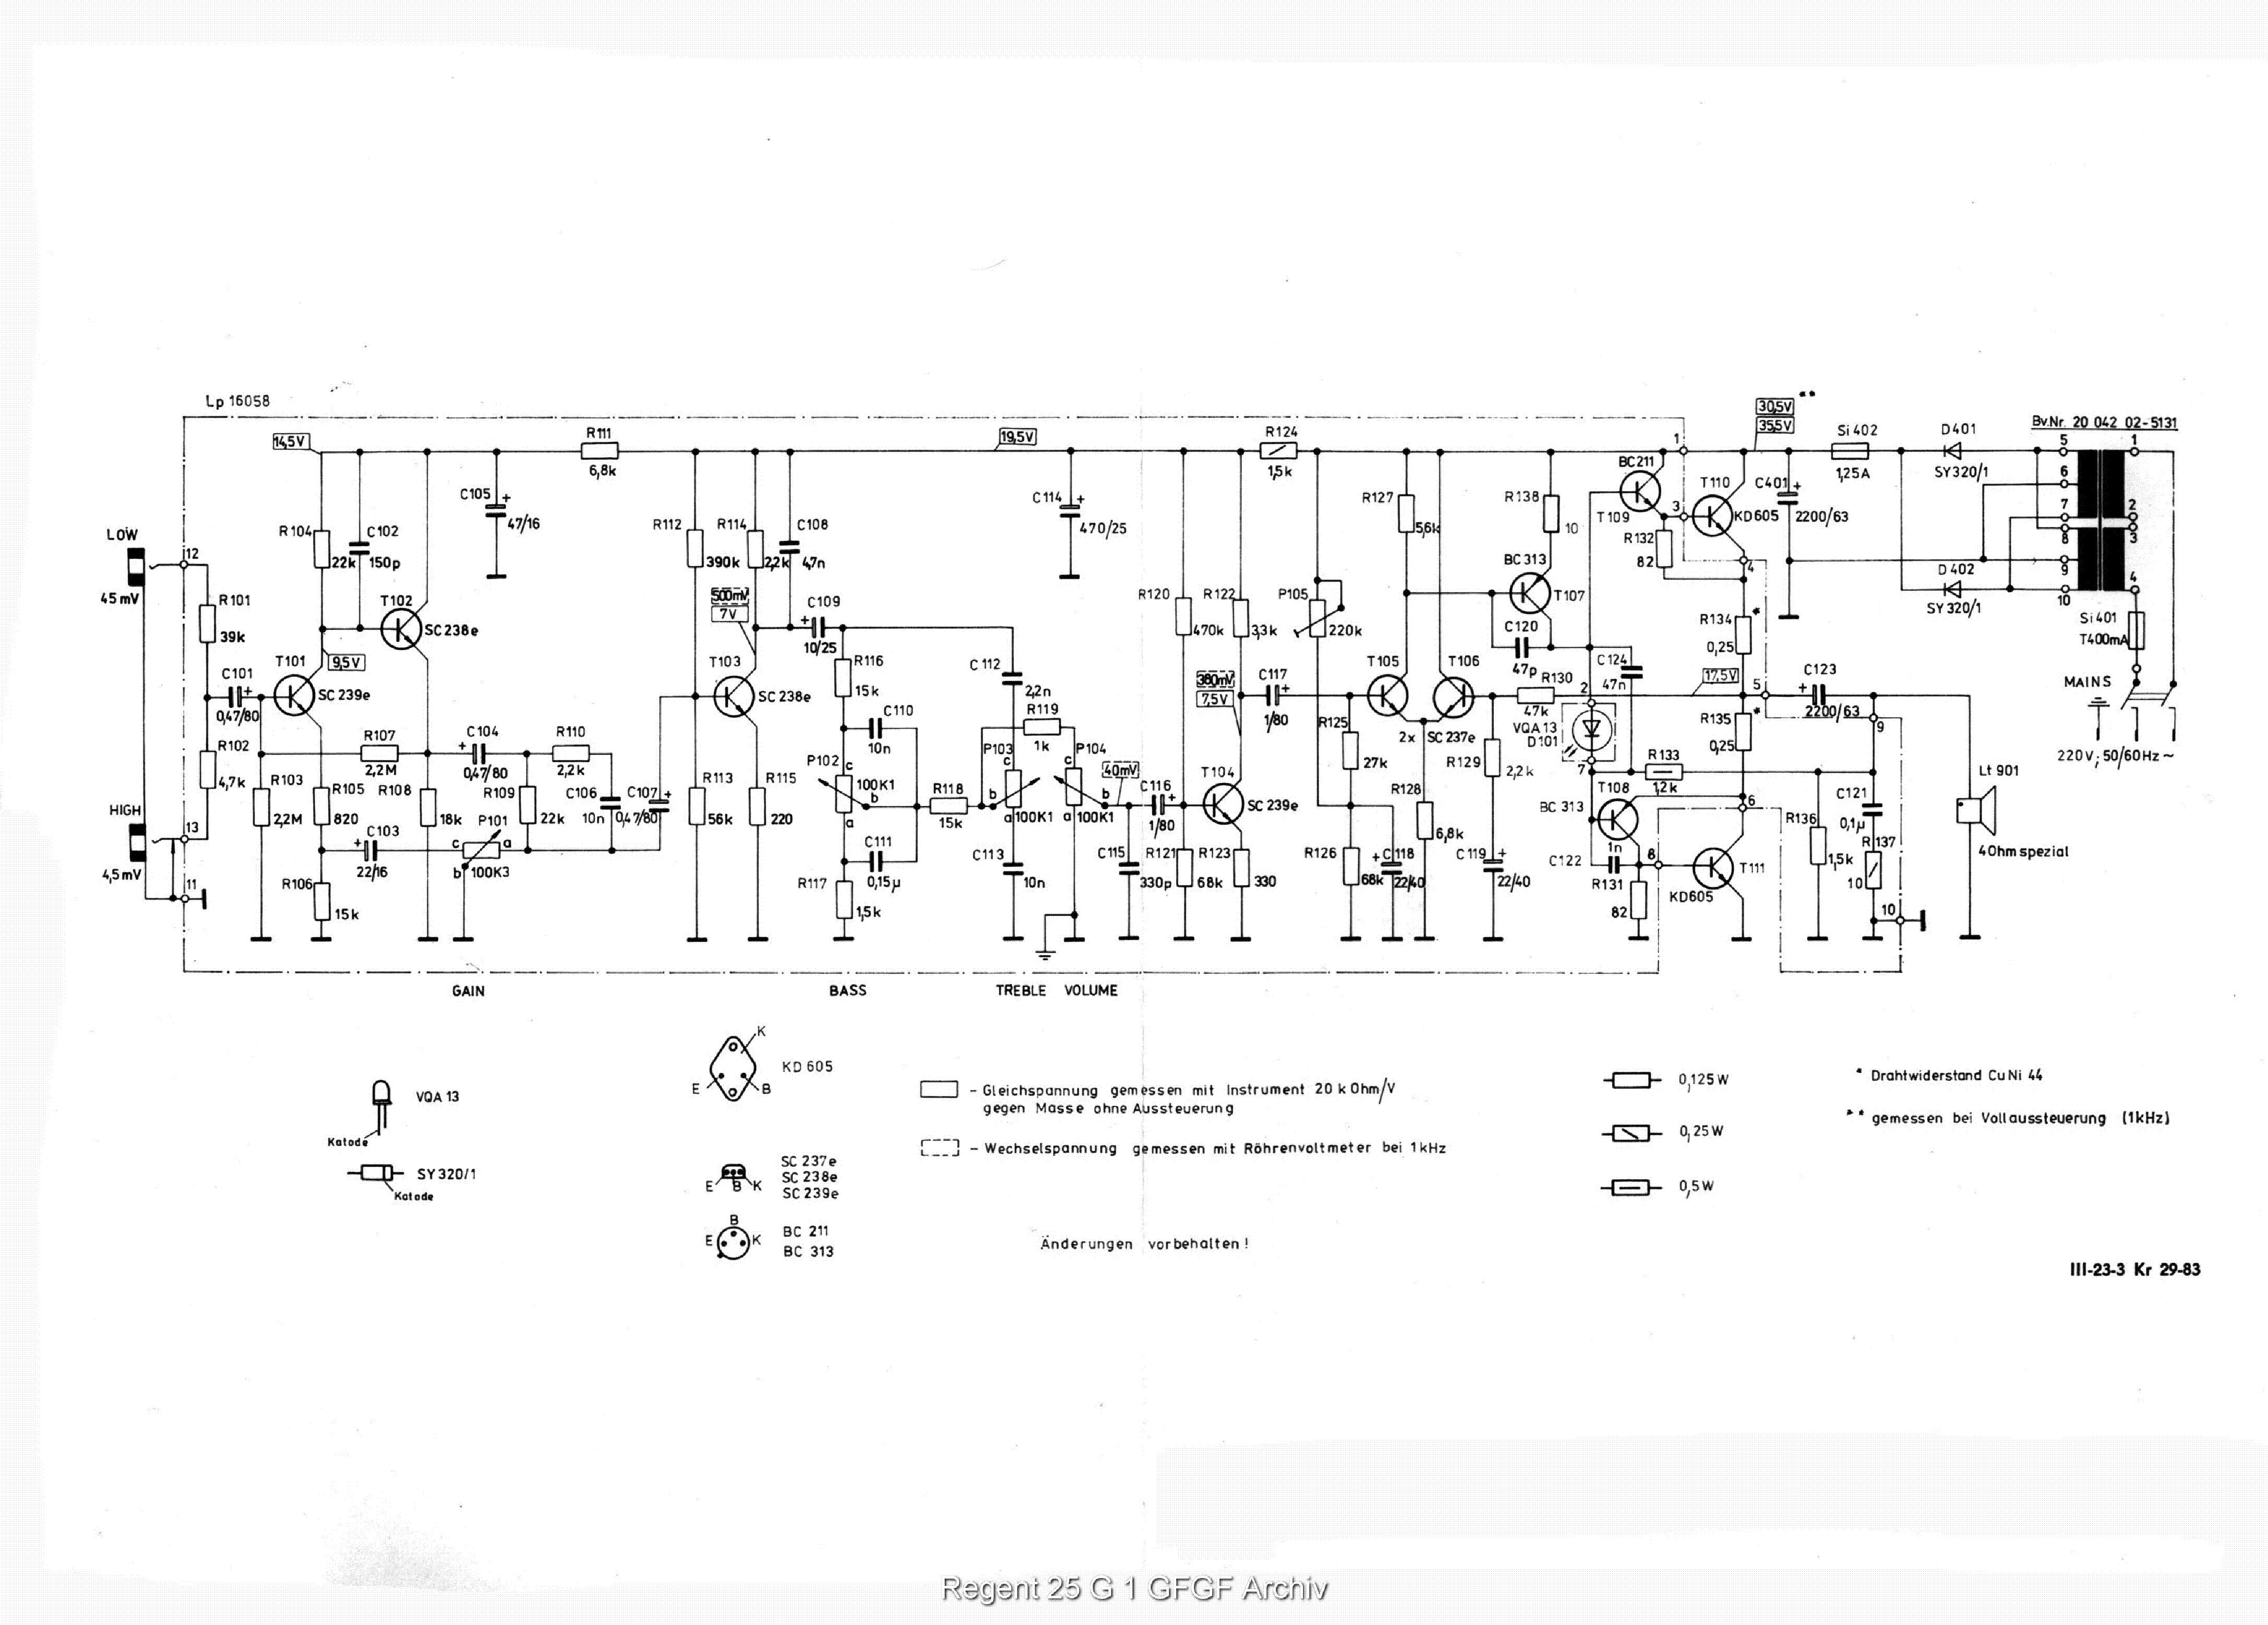 vermona regent 25 g1 sch service manual download schematics eeprom rh elektrotanya com 820 g1 service manual 840 g1 service manual